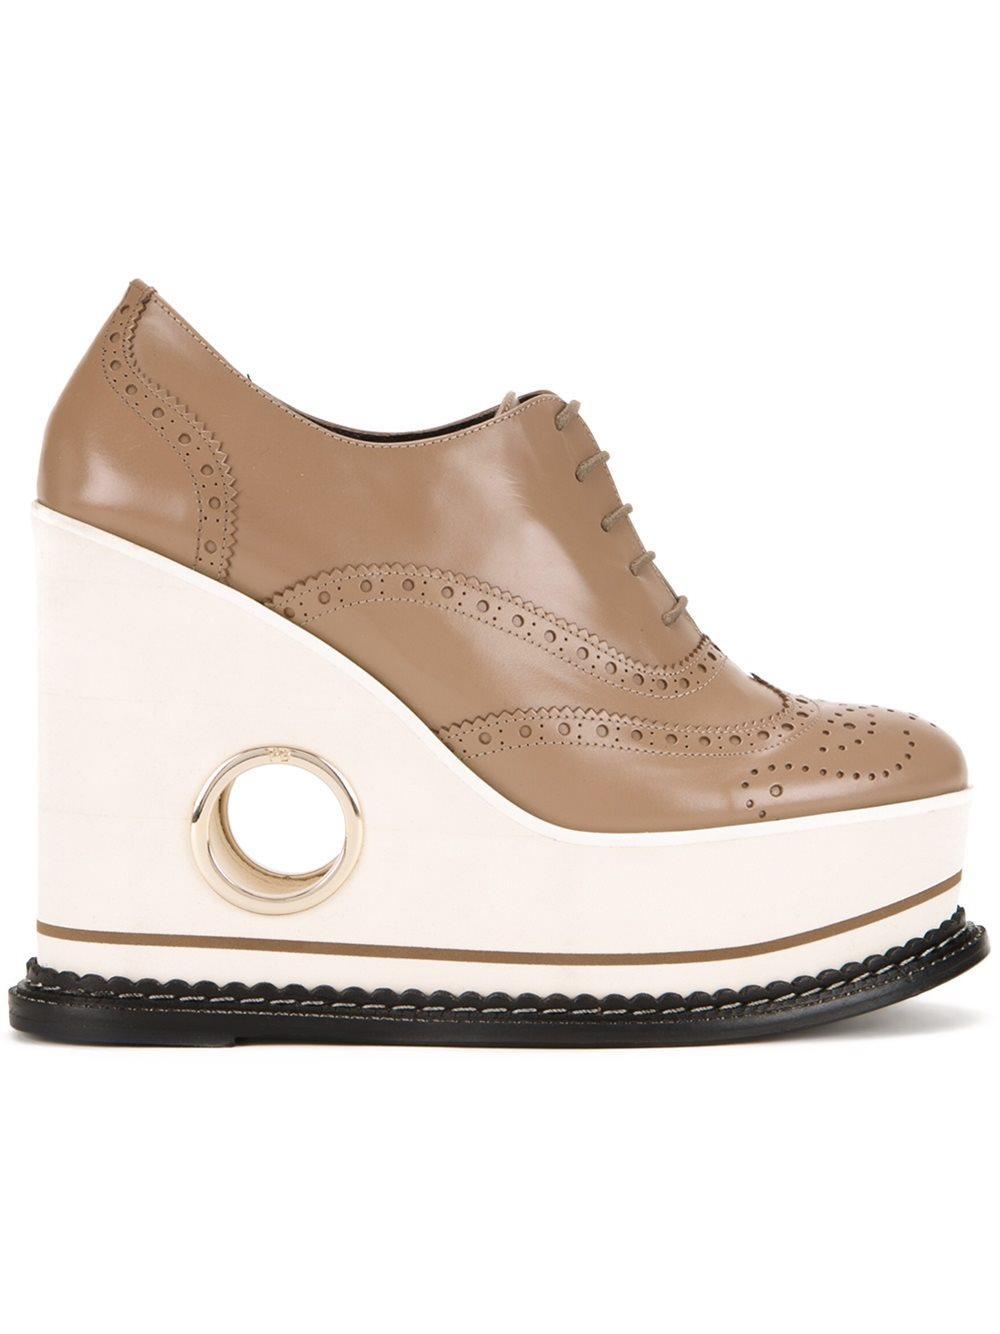 Paloma Barcelo Shoes Sale